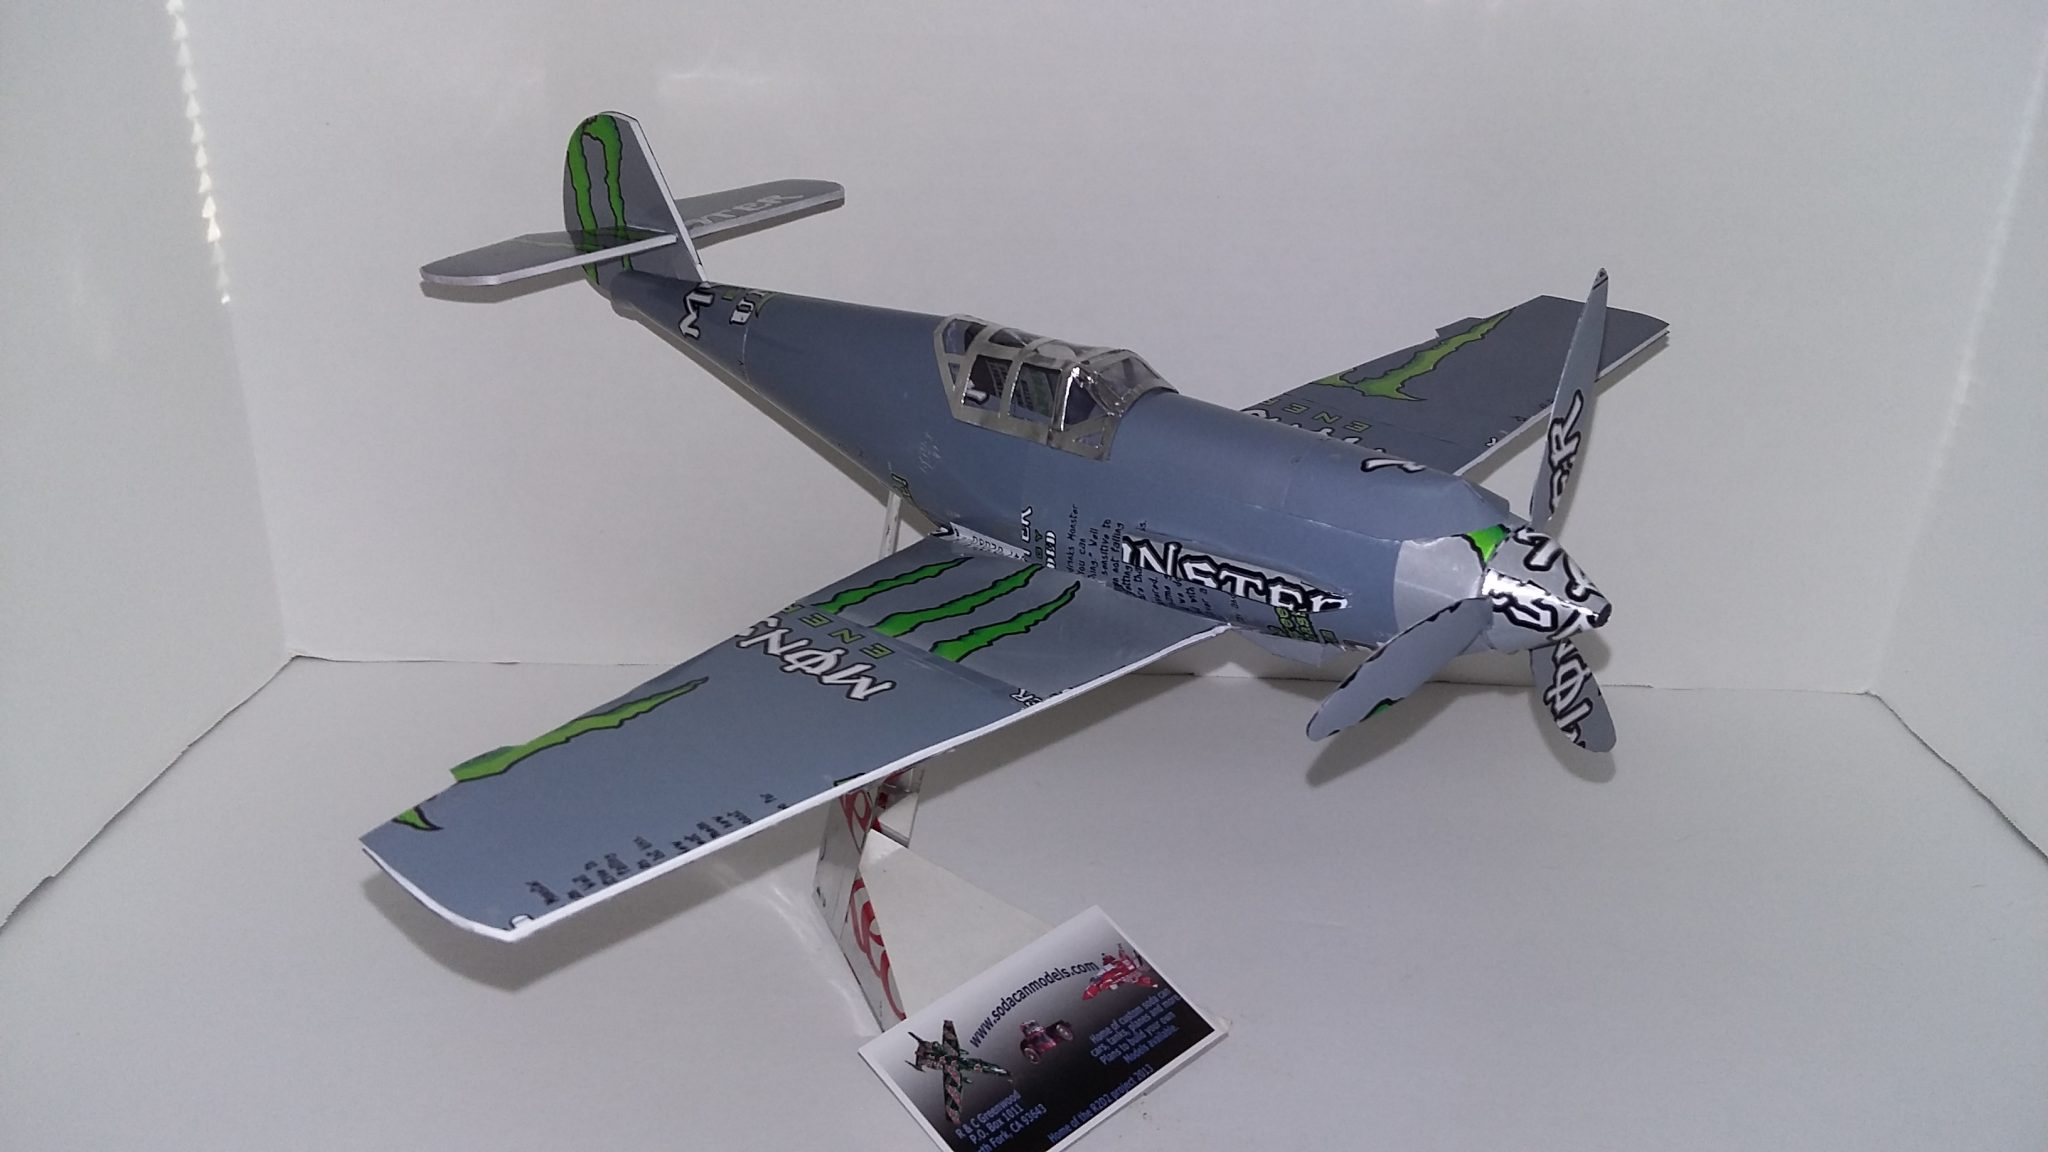 soda can Me-109